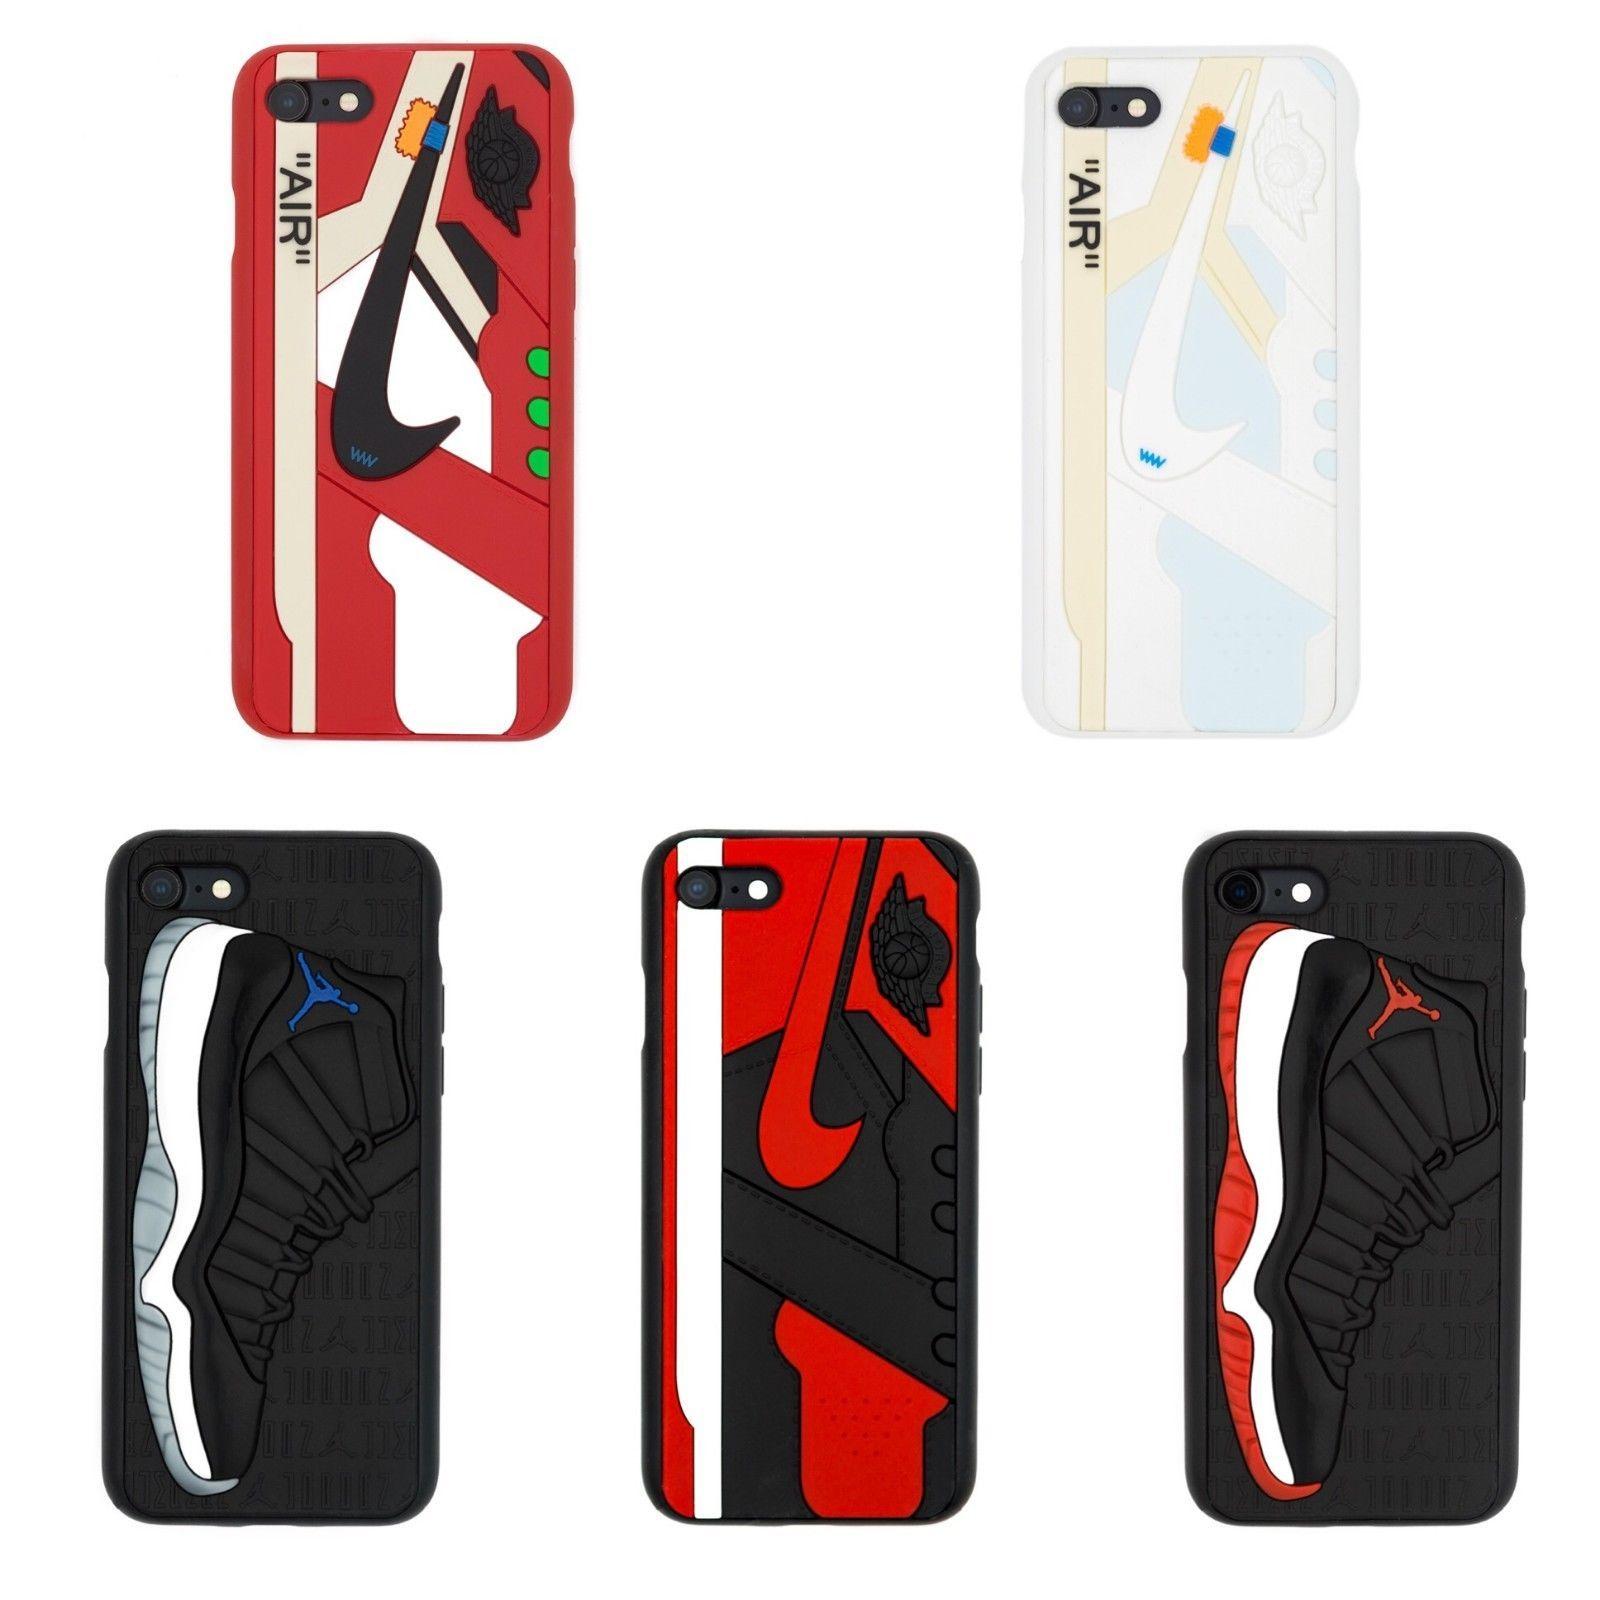 Nike Jordan 1s 11s Bred Space Jam 3D iPhone X 6 6s 7 8 Plus Case ...